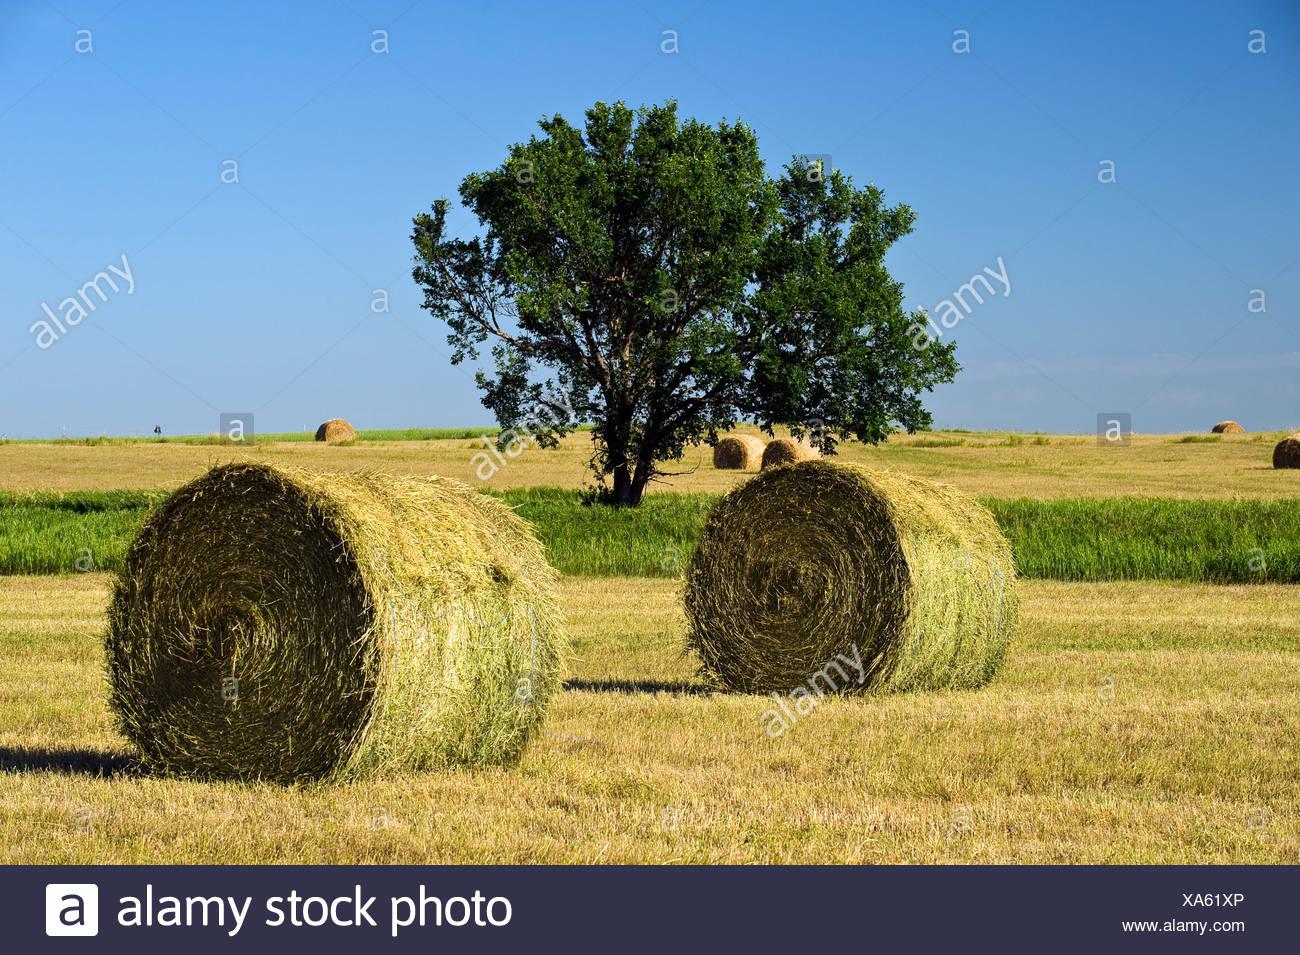 Hay rolls and tree. Near Estevan, Saskatchewan, Canada - Stock Image